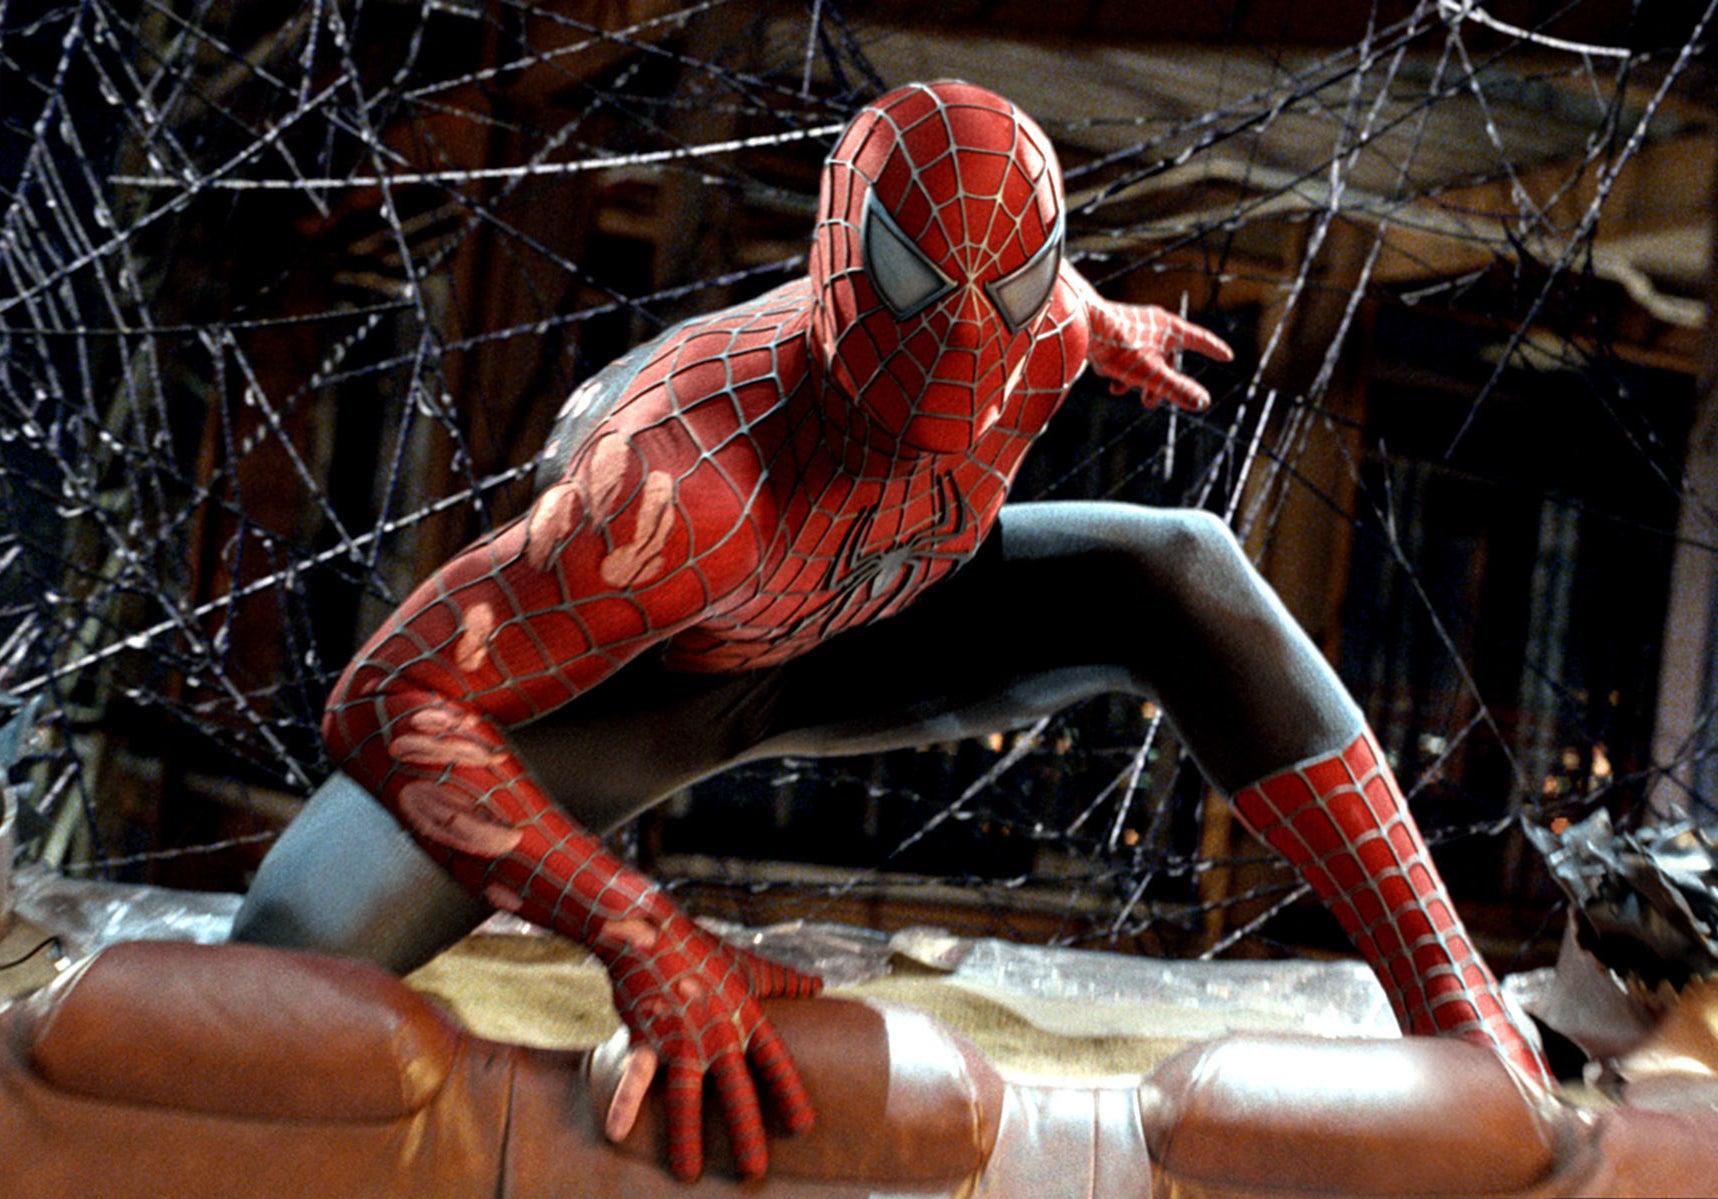 Spider-Man in costume